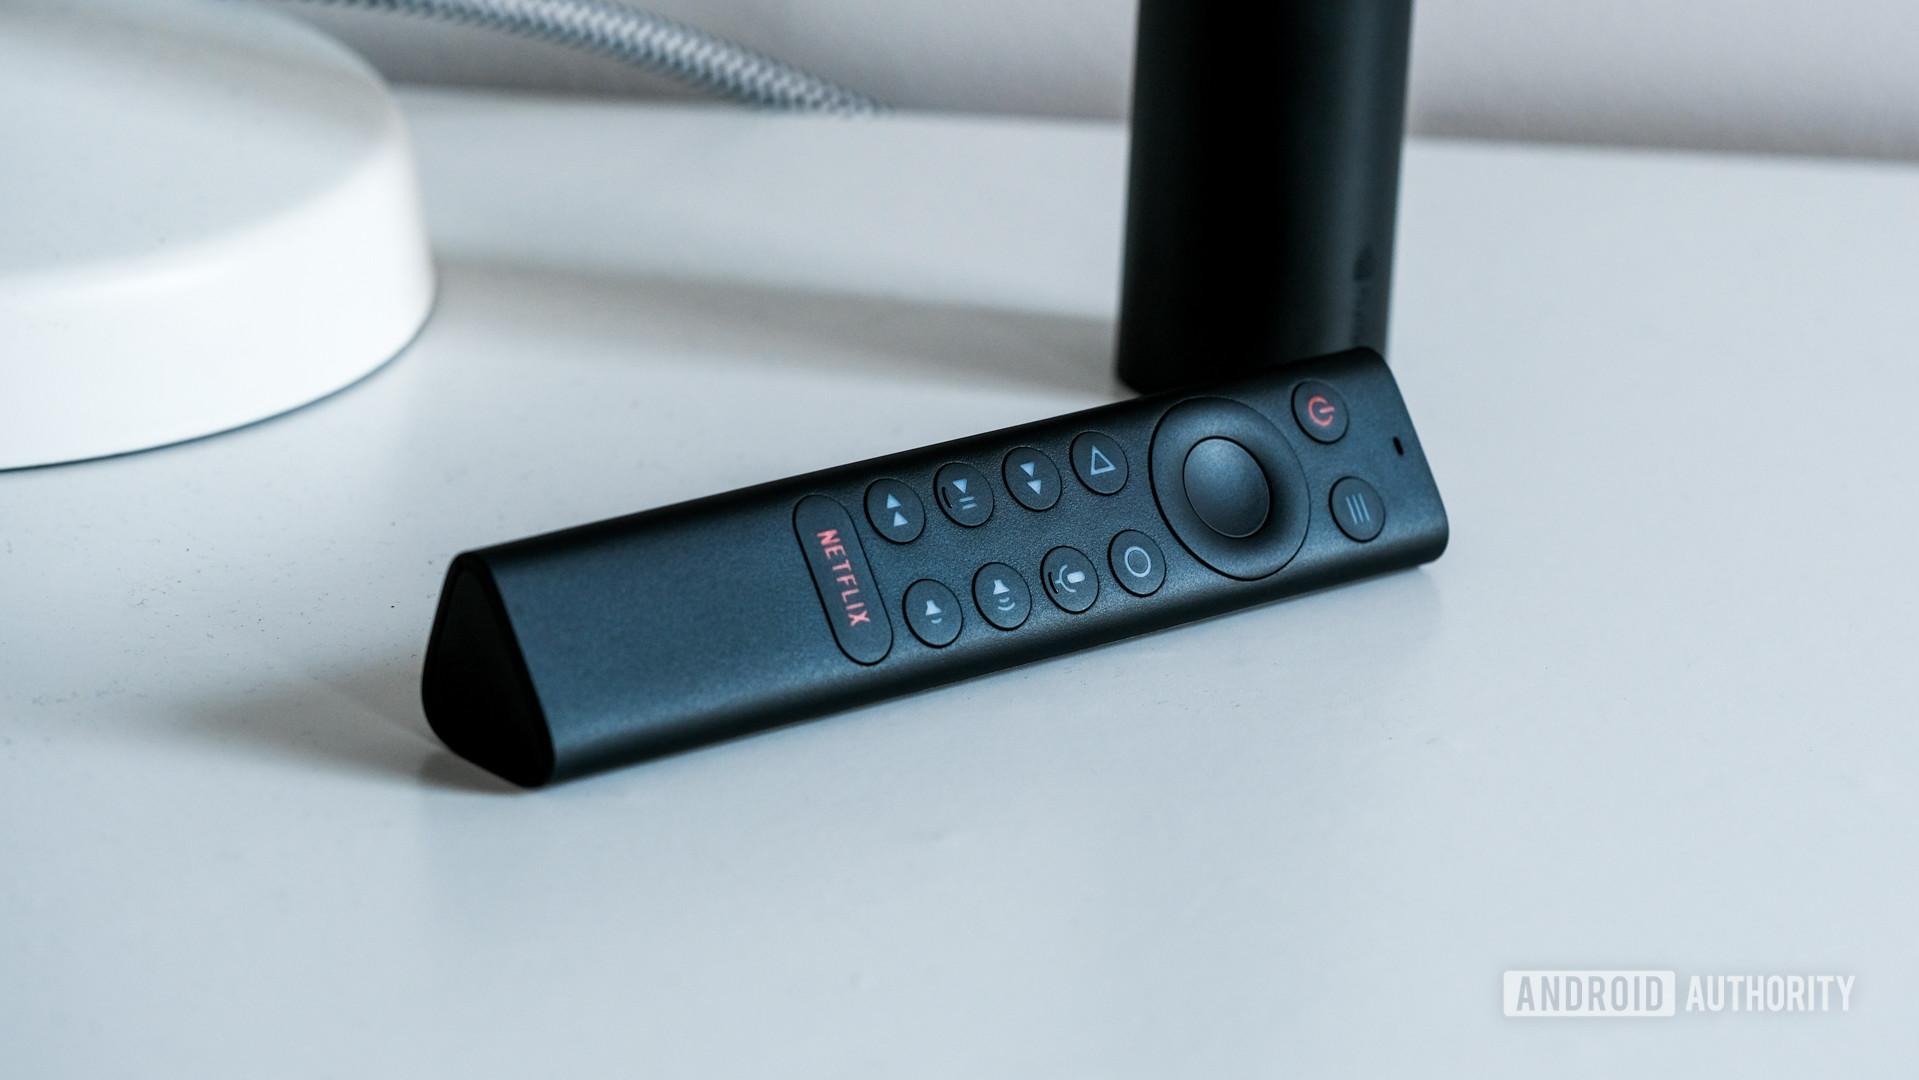 NVIDA Shield TV 2019 remote control on table